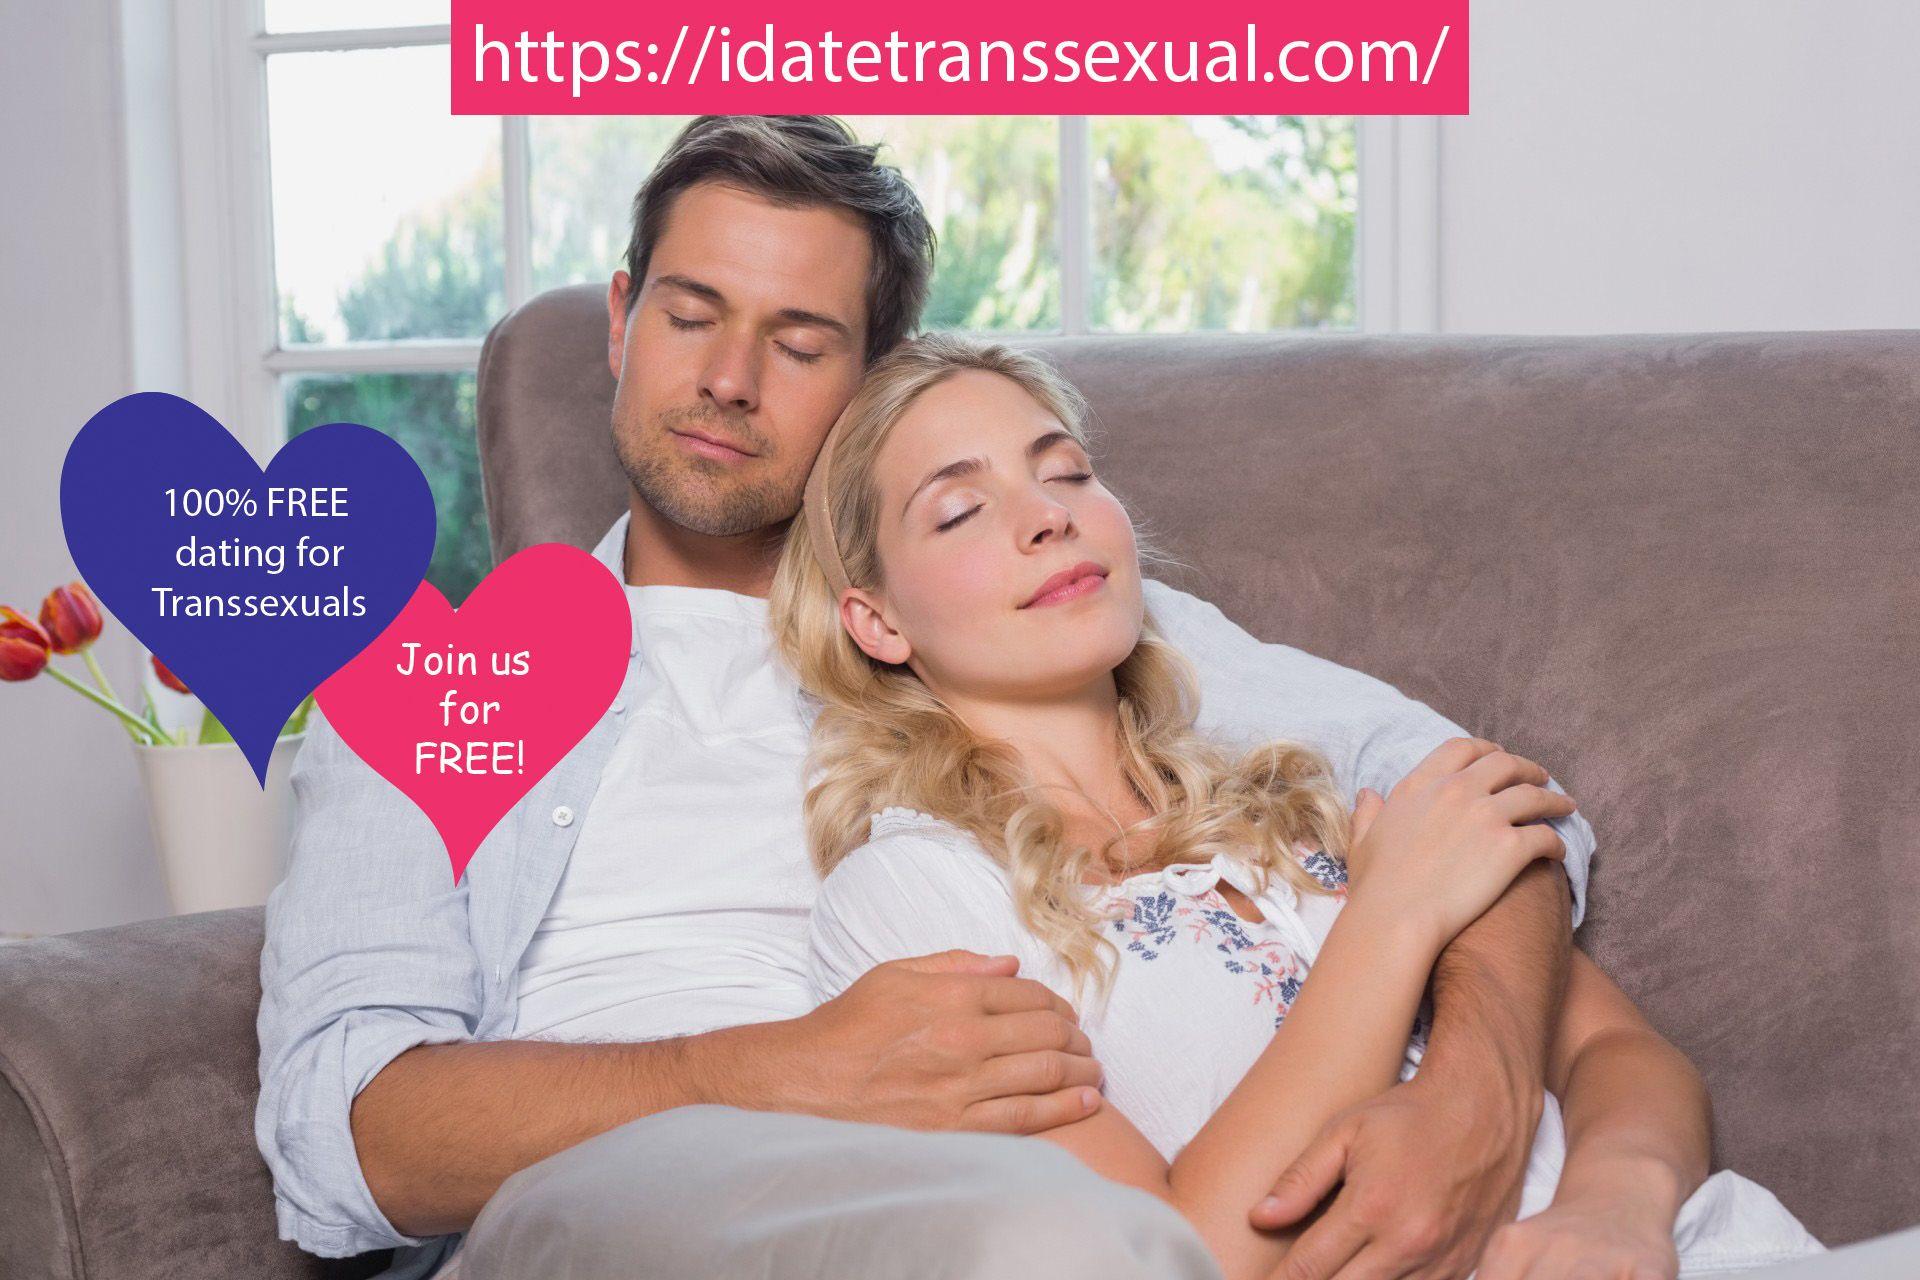 jackfoundjill dating site